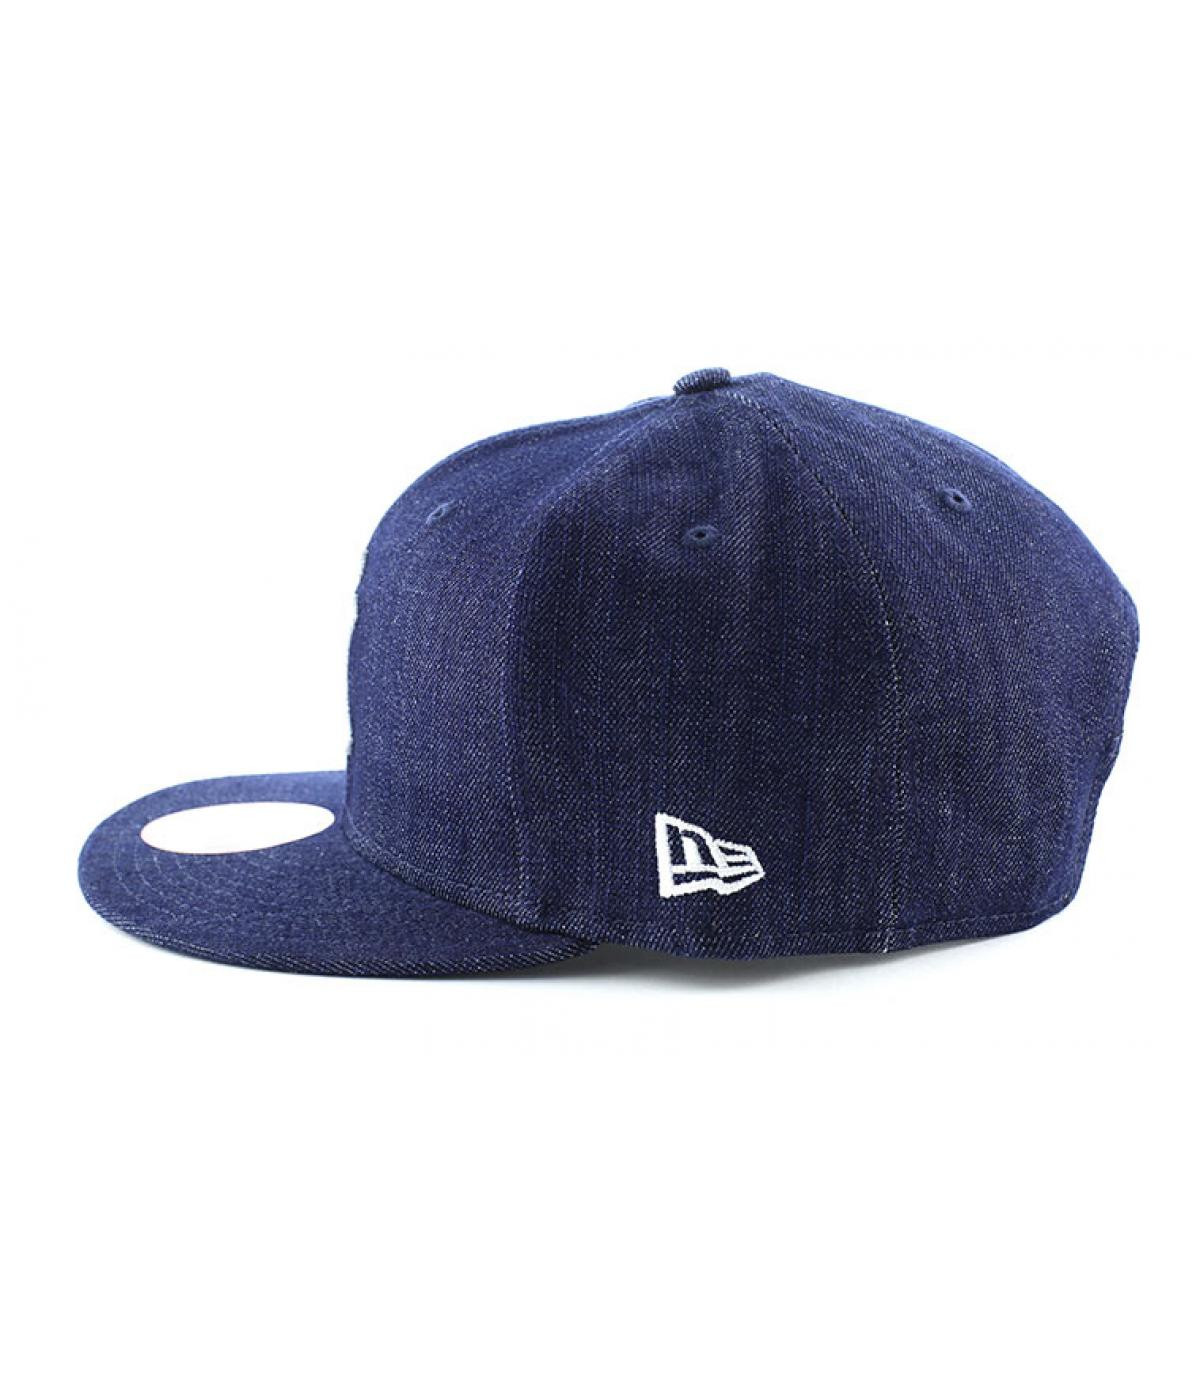 Détails Snapback NY MLB denim basic - image 4